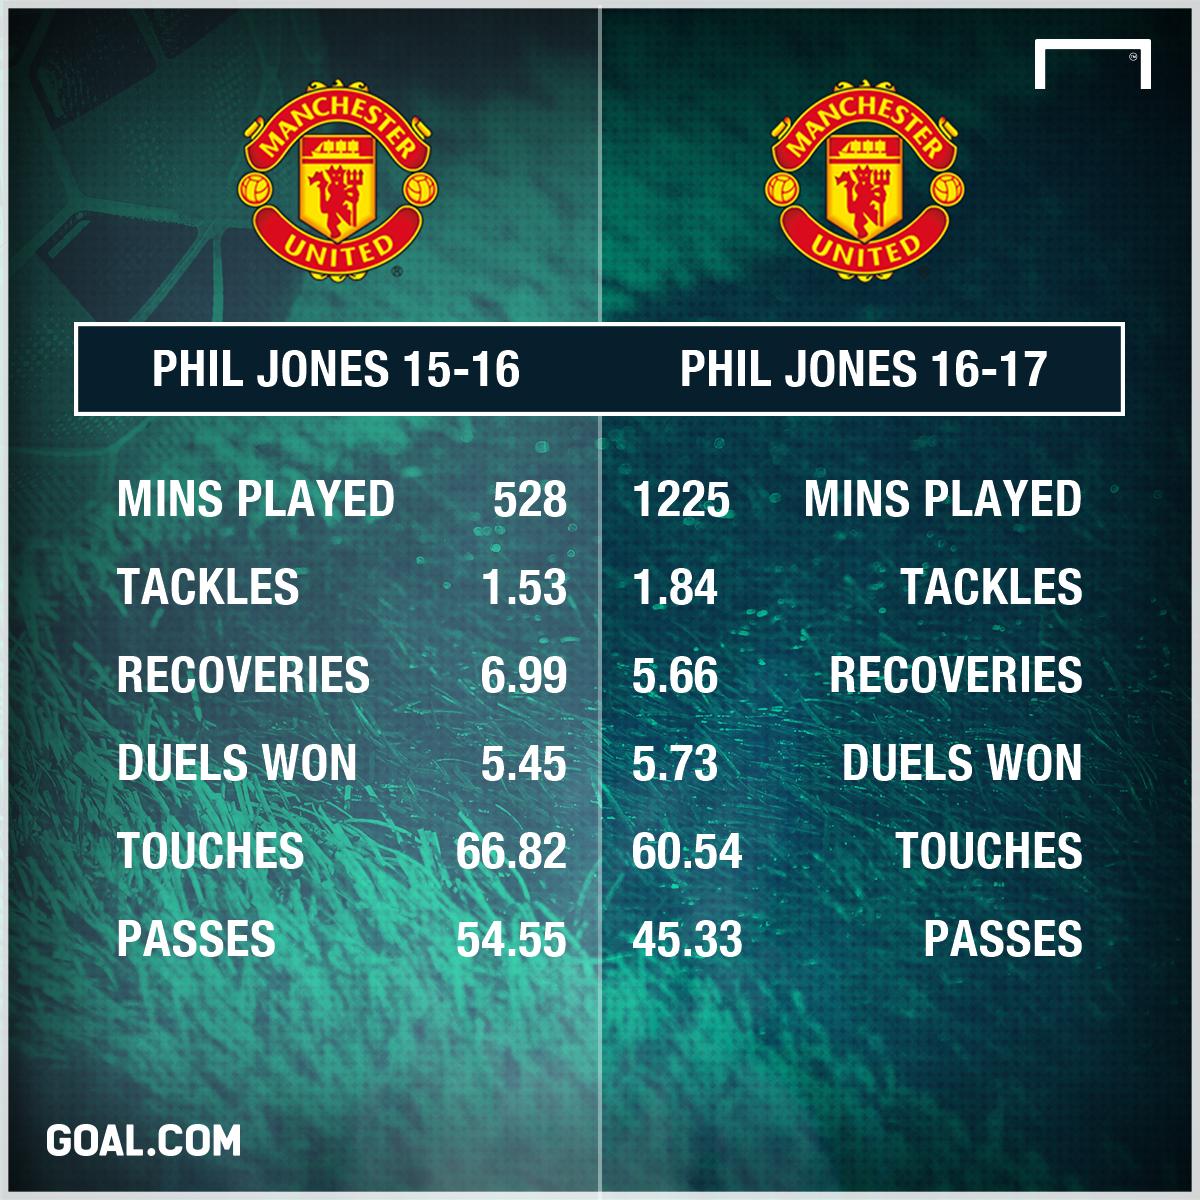 Phil Jones Manchester United 15-17